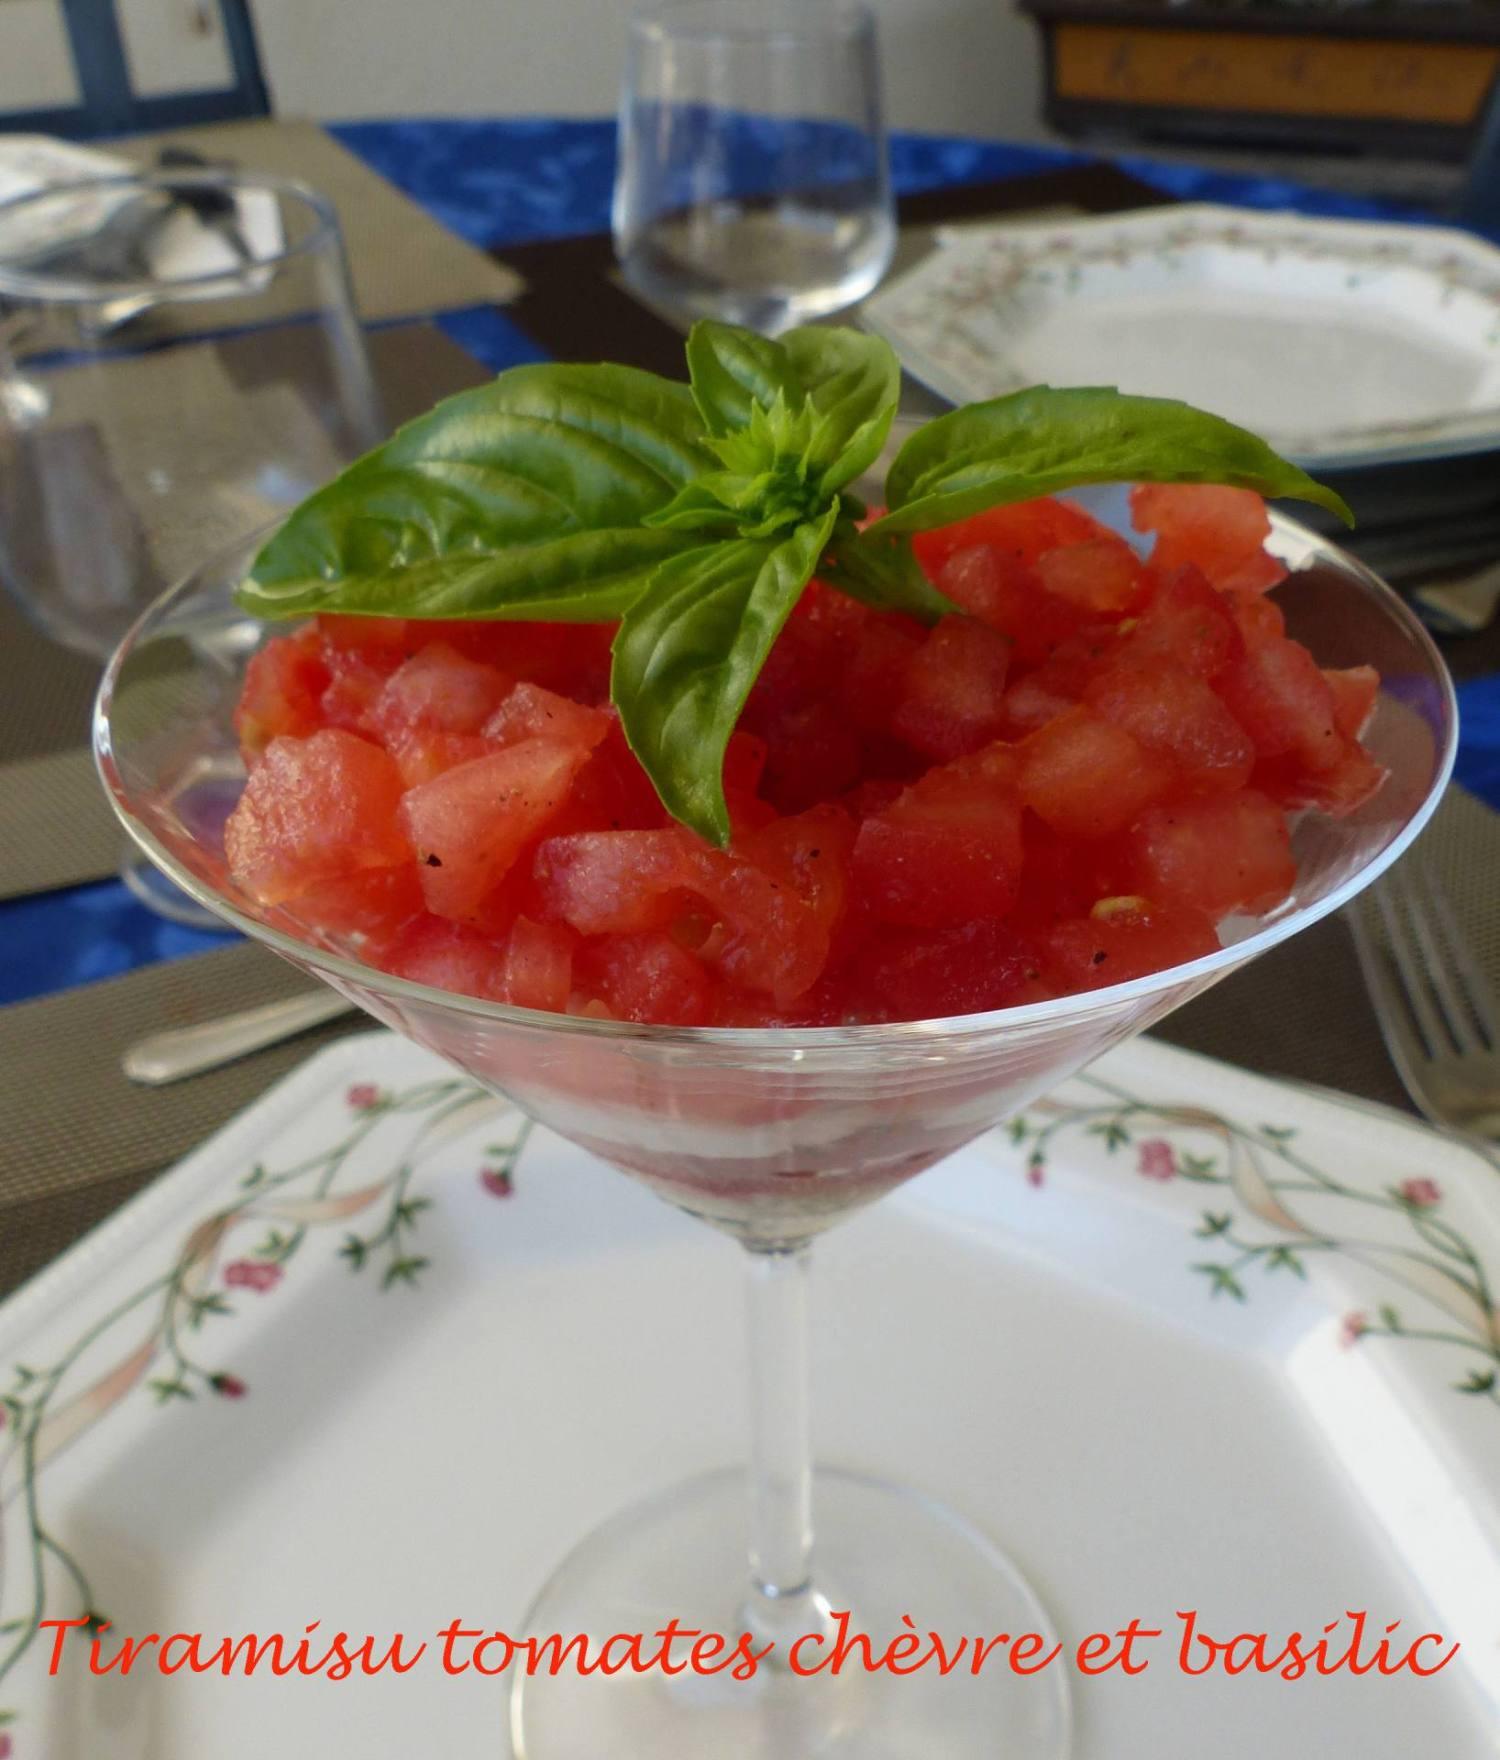 Tiramisu tomates chèvre et basilic P1190662 R